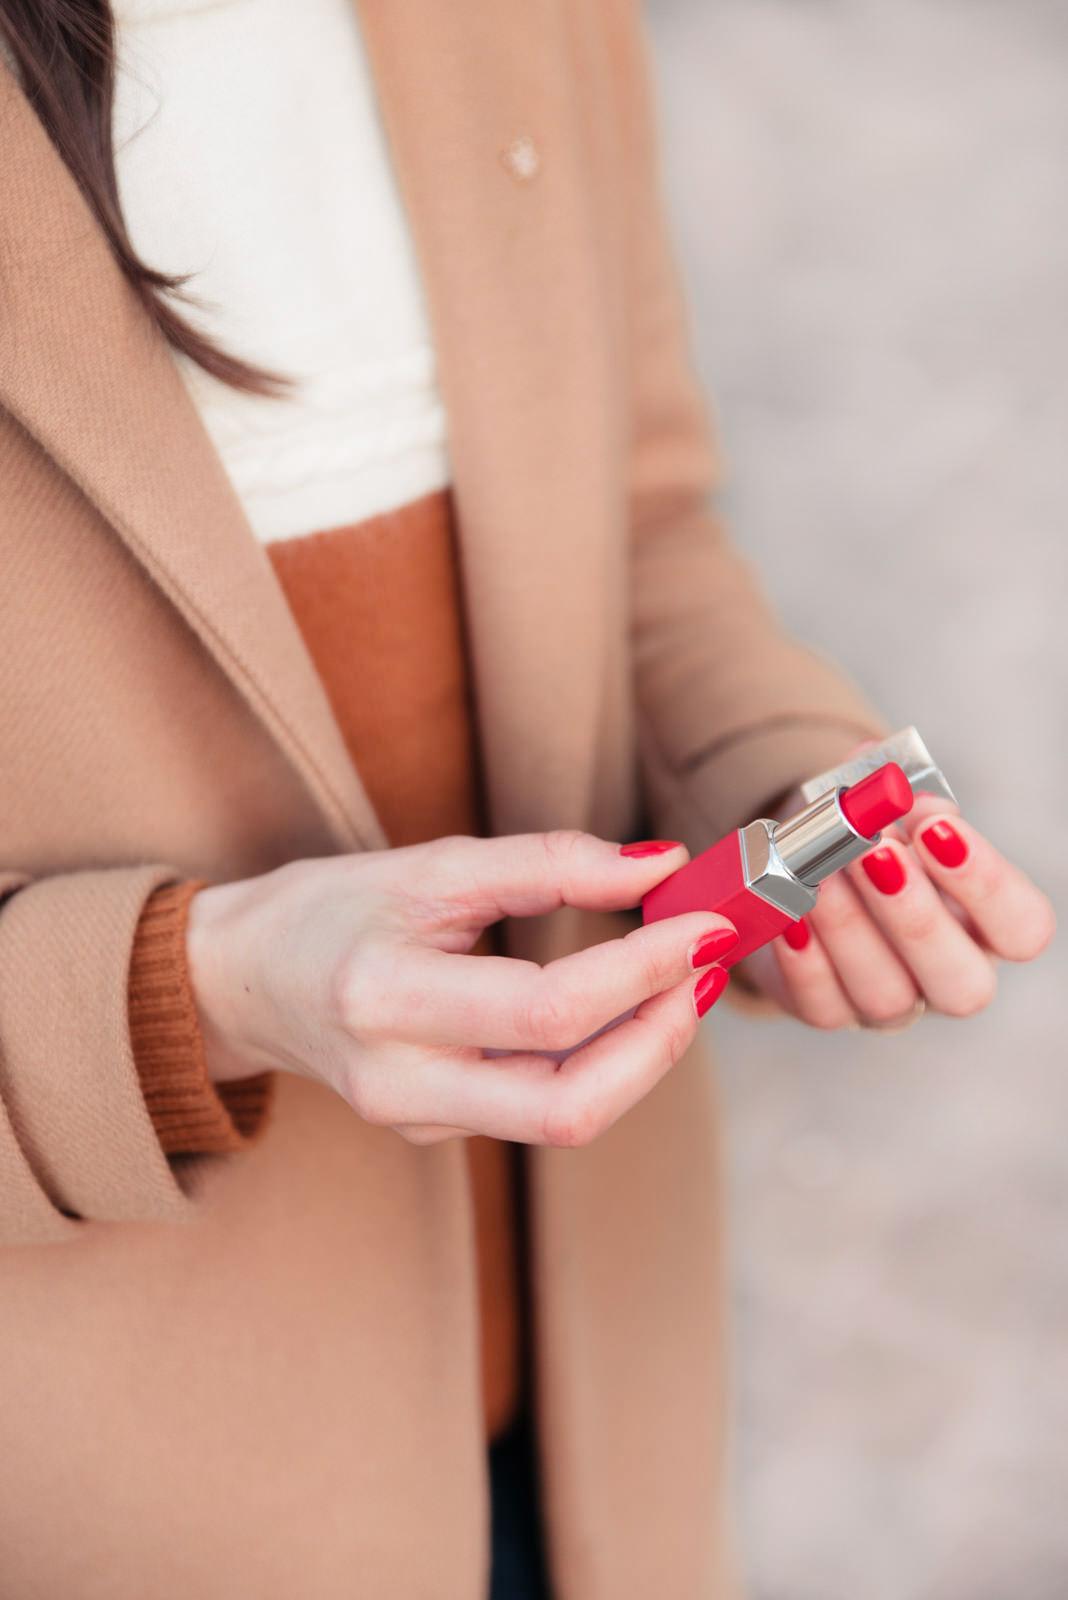 Blog-Mode-And-The-City-Beaute-Mes-3-rouges-a-levres-rouges-favoris-4